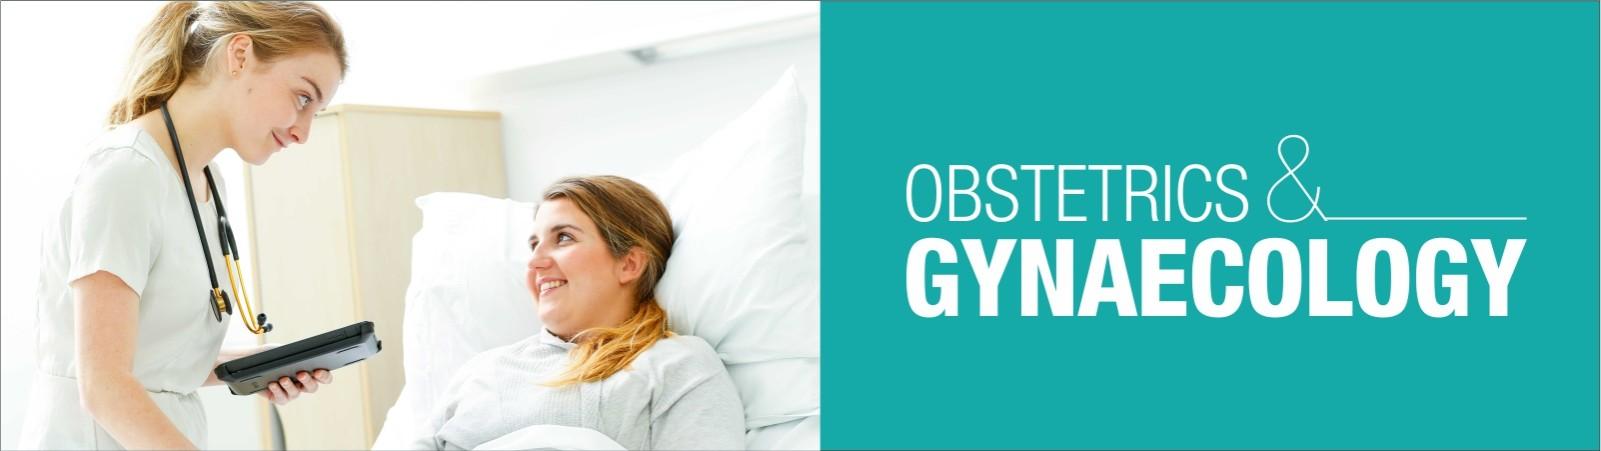 Gynaecology